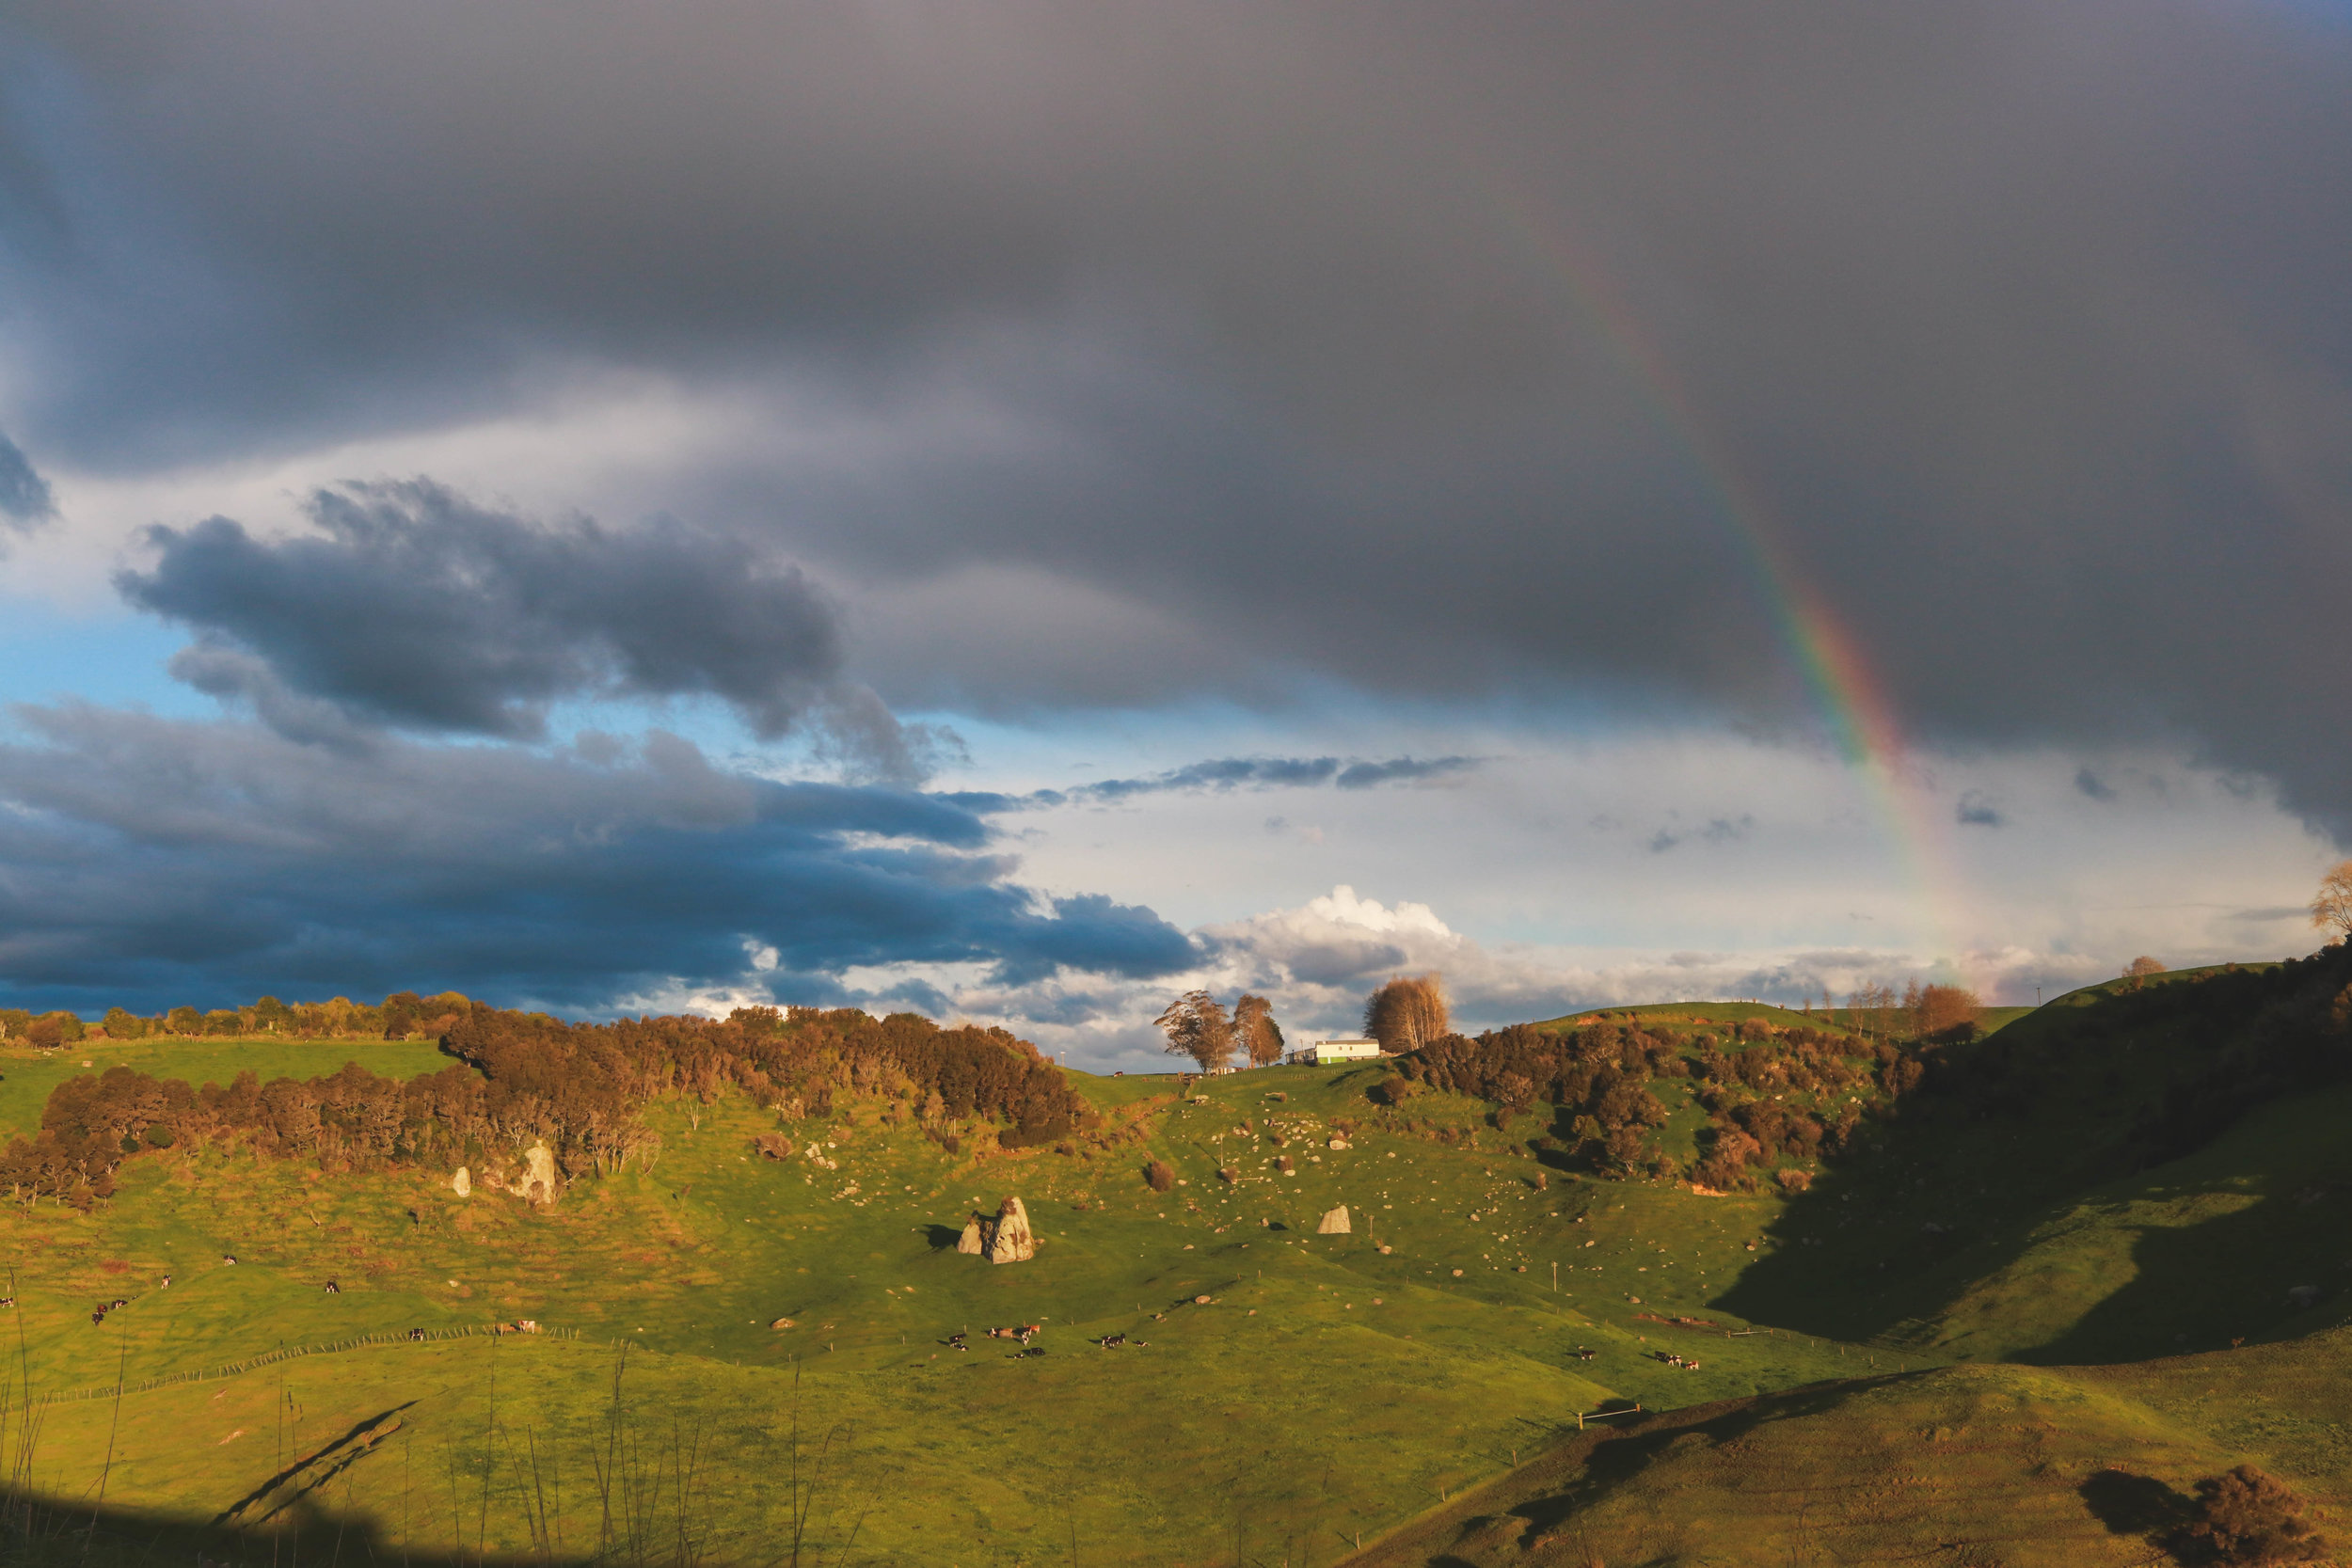 Rainbow over the limestone rocks